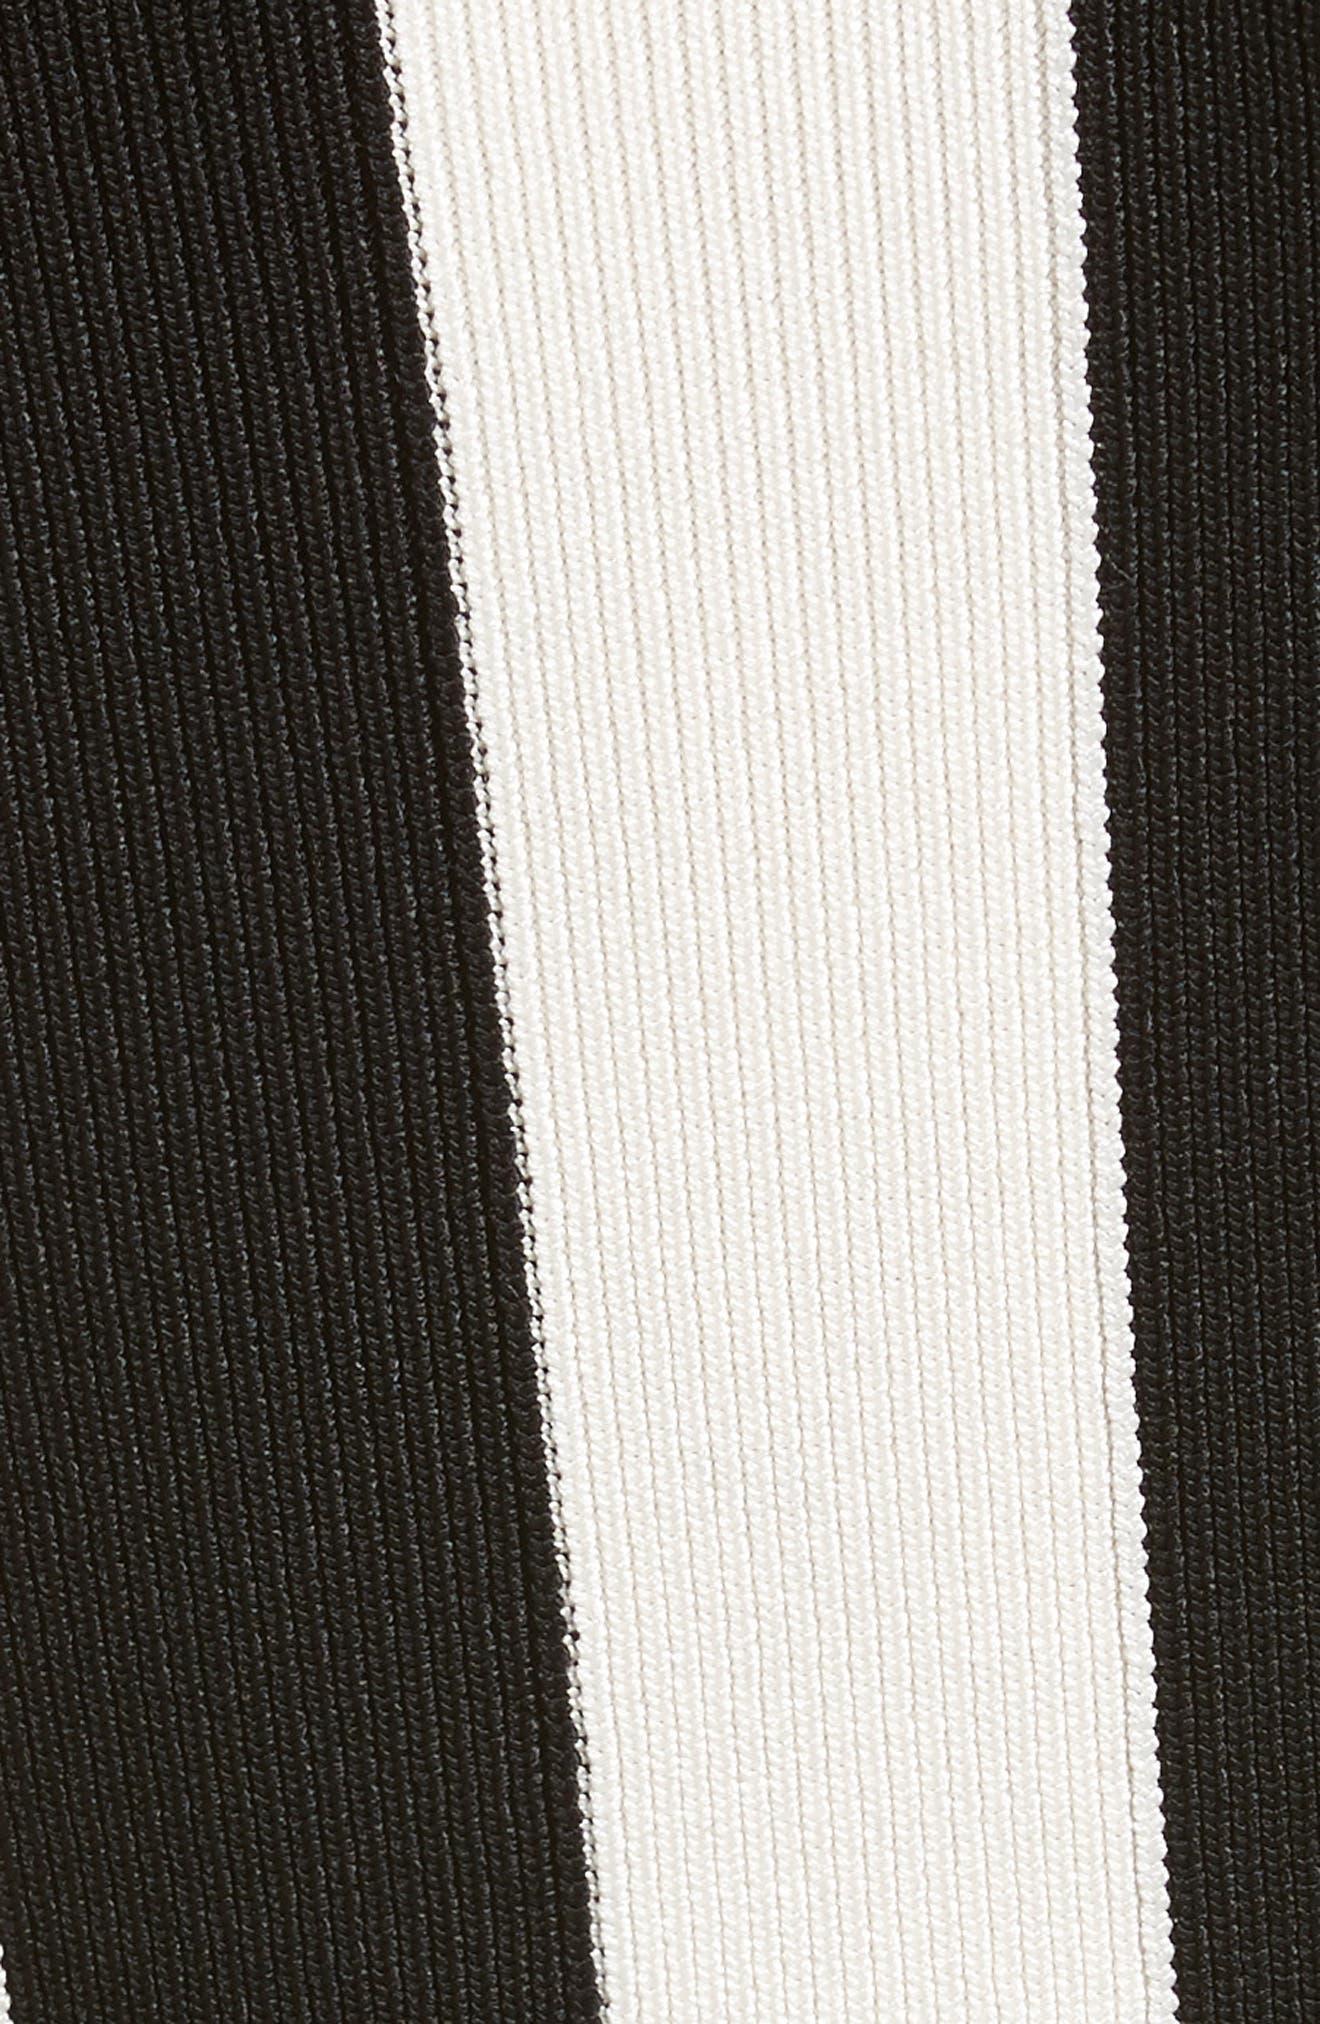 Stripe Turtleneck,                             Alternate thumbnail 5, color,                             001